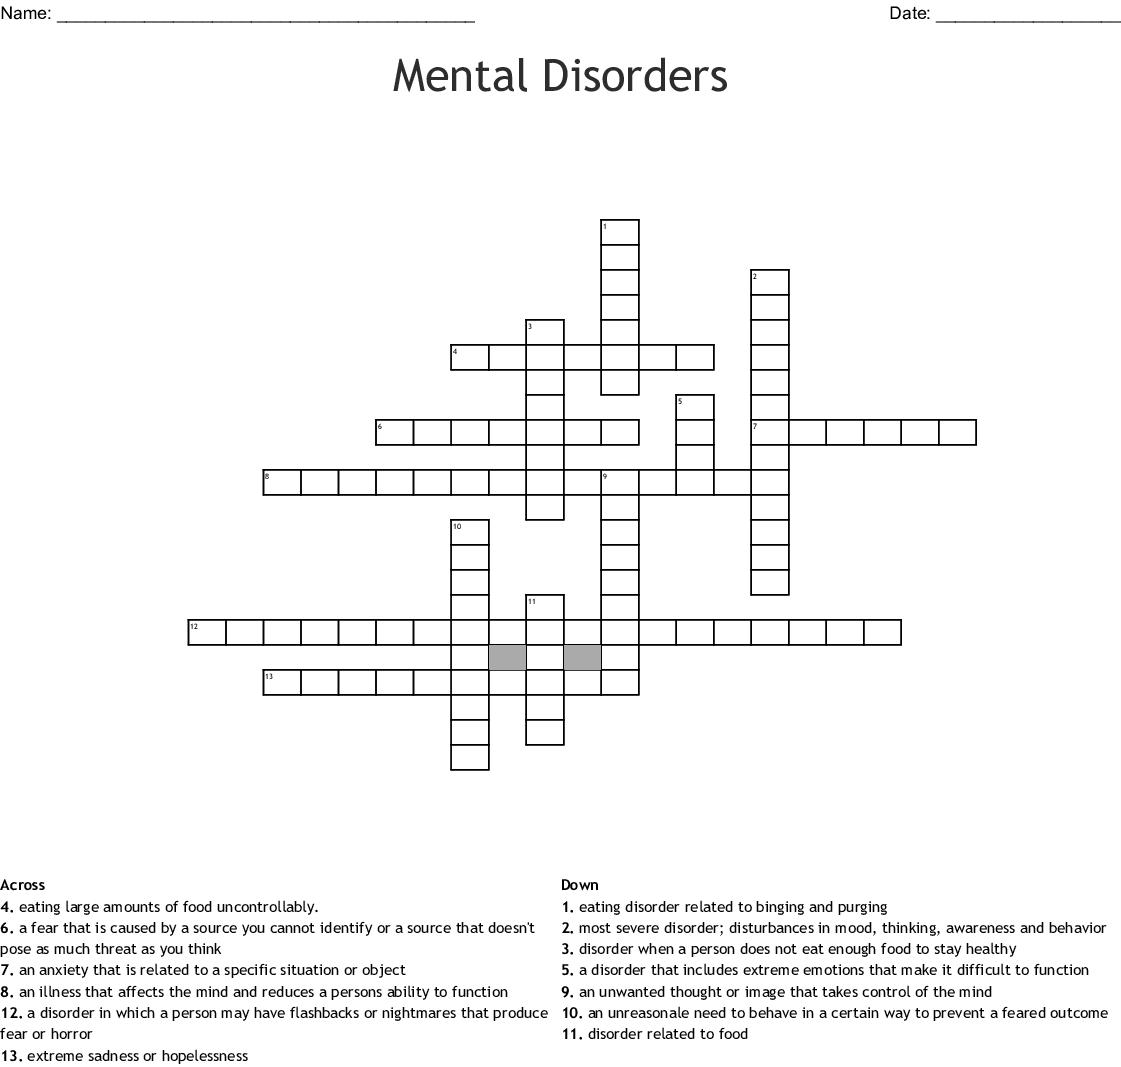 Mental Disorders Crossword Wordmint